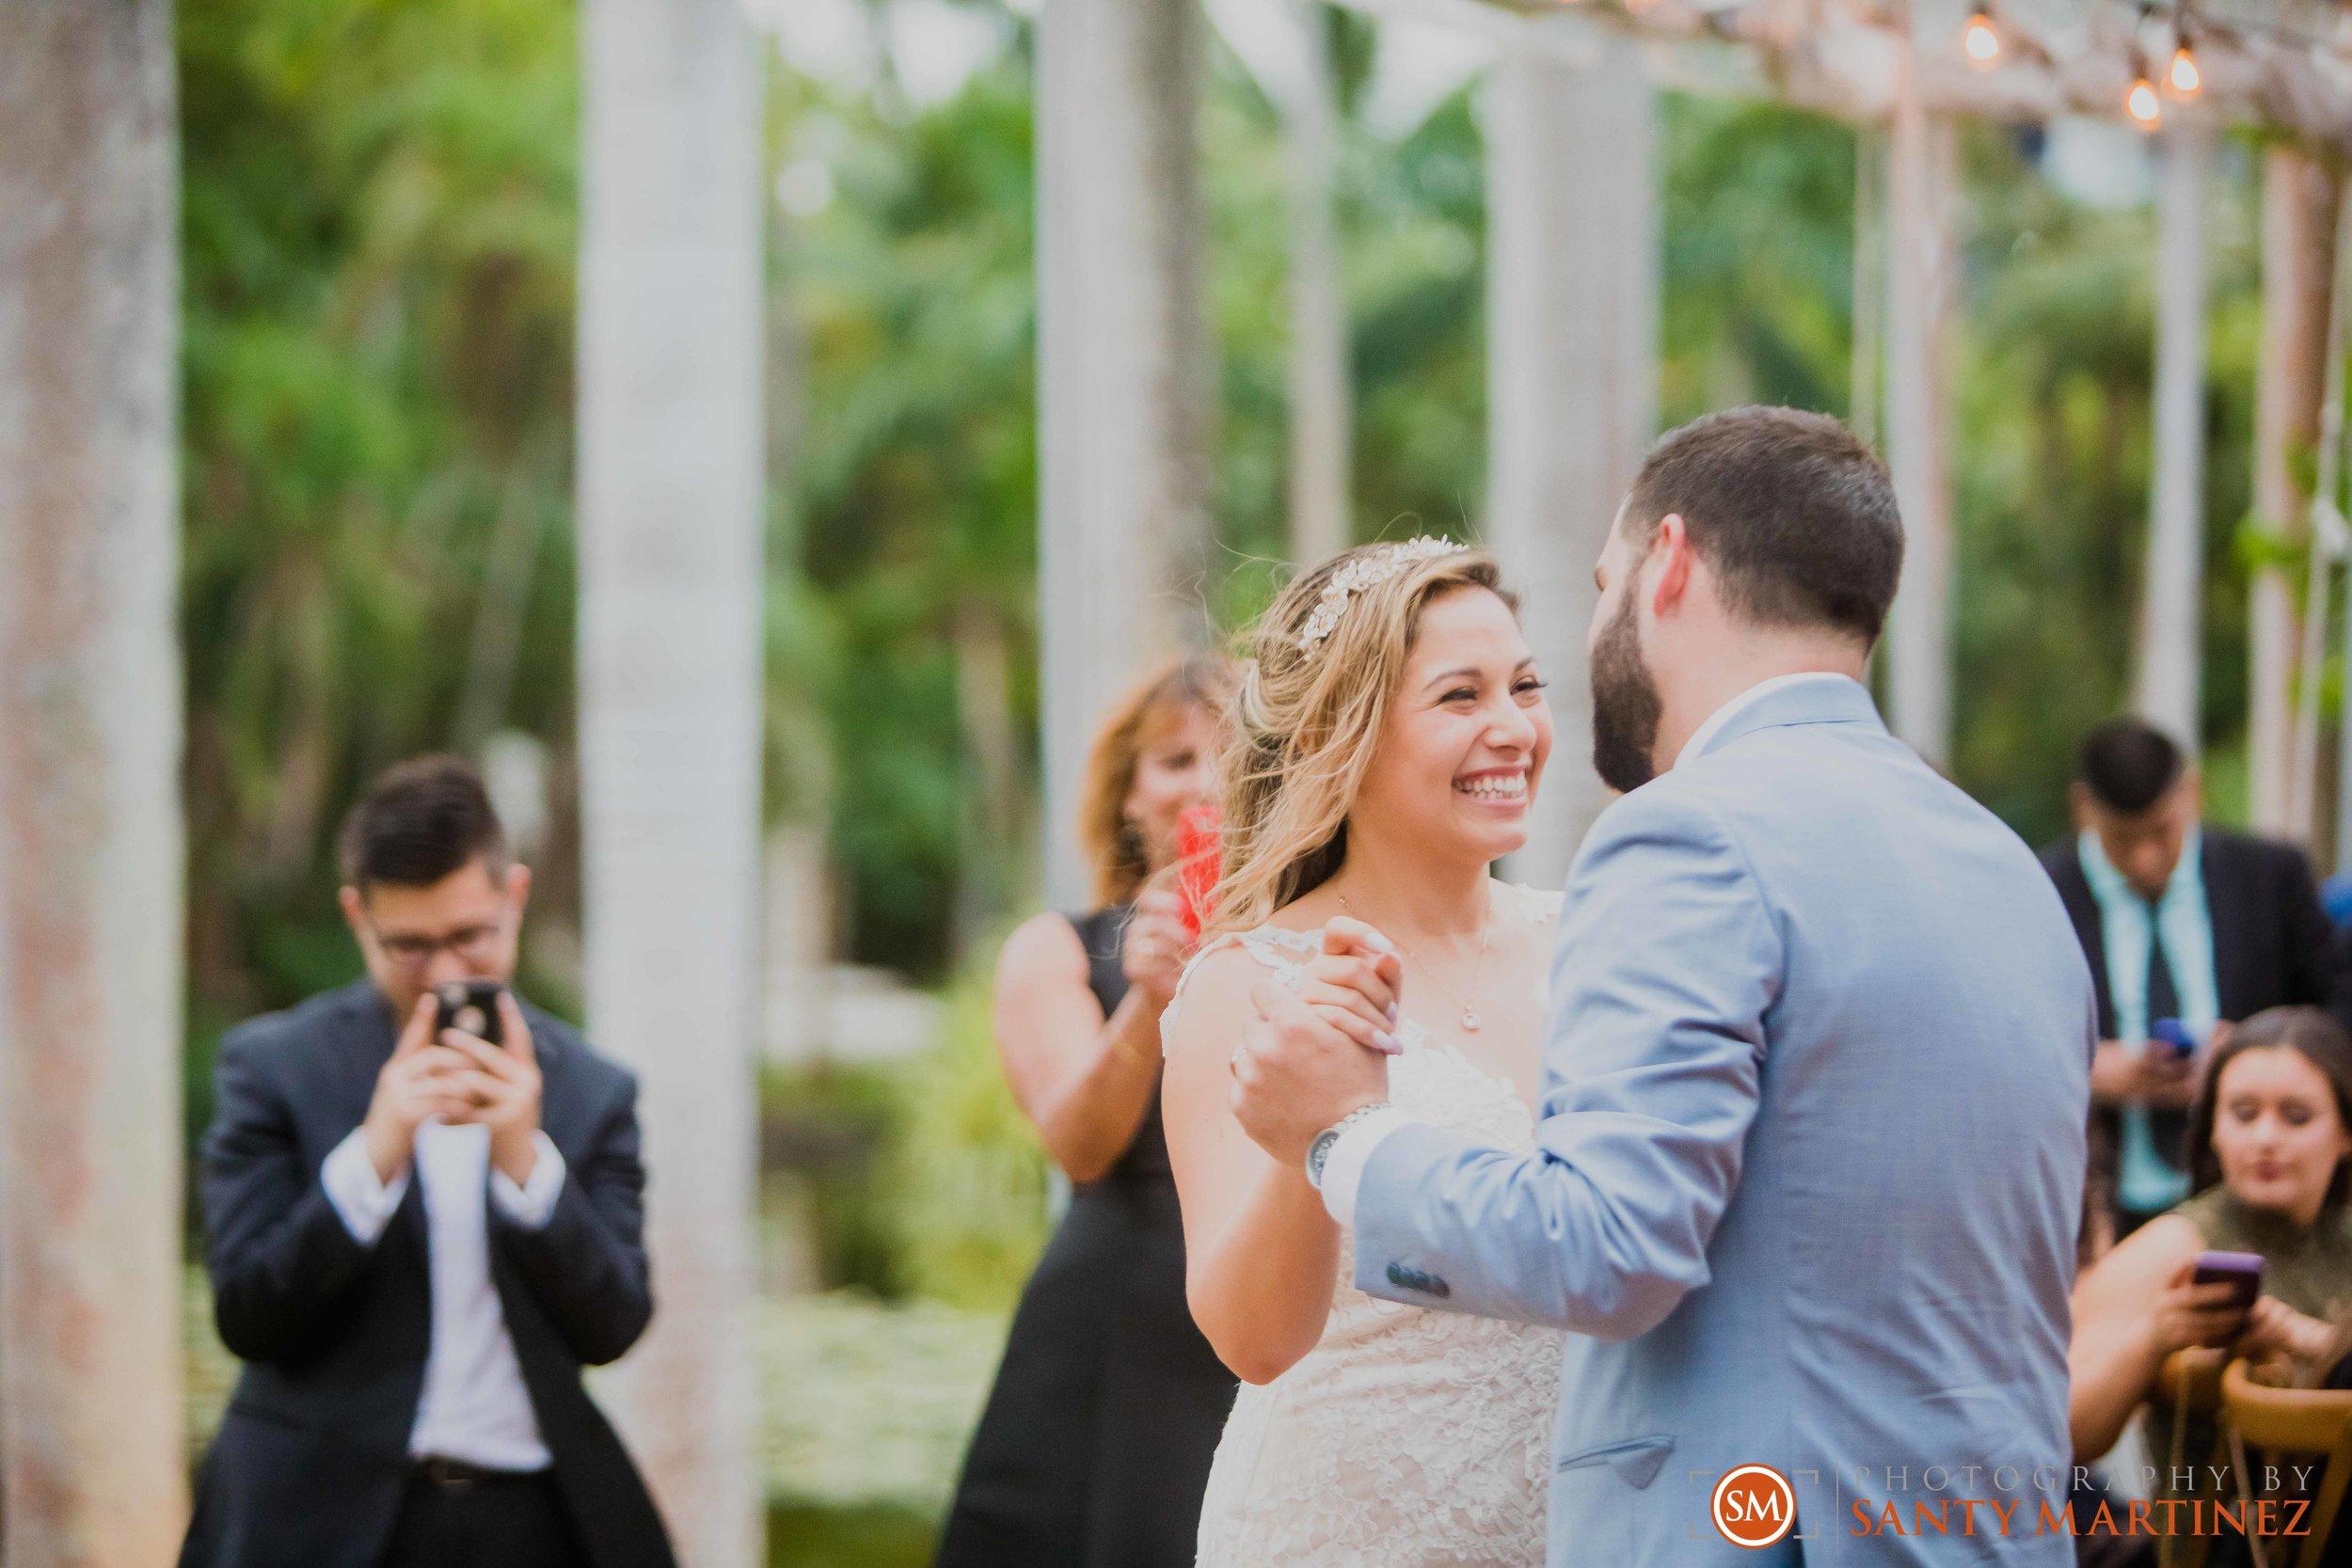 Wedding Bonnet House - Santy Martinez Photography-54.jpg